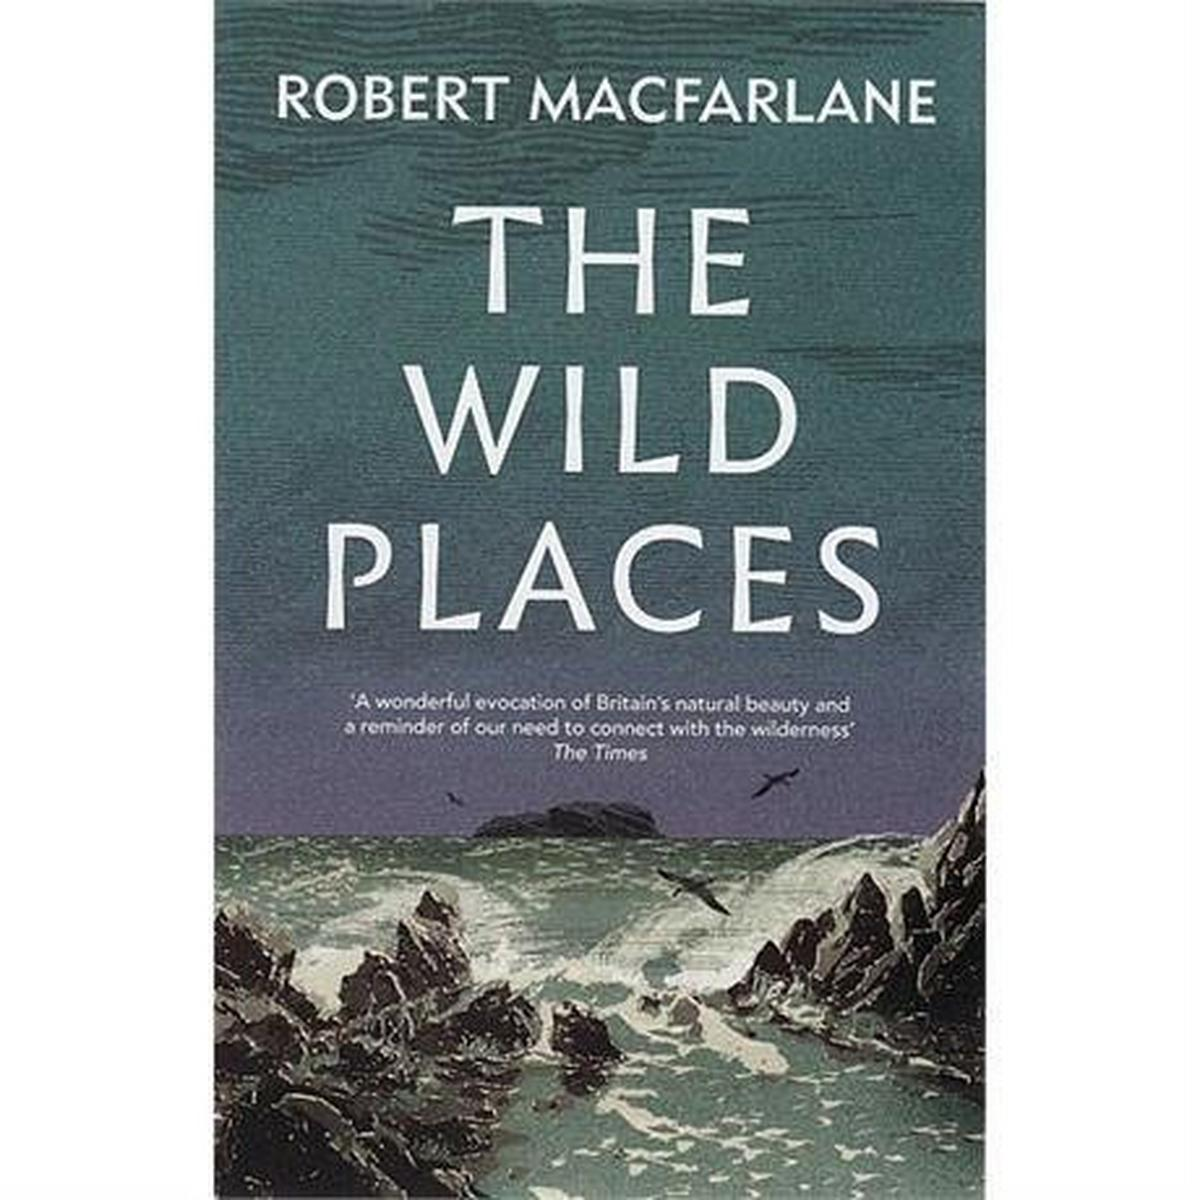 Miscellaneous Book: The Wild Places: Robert Macfarlane